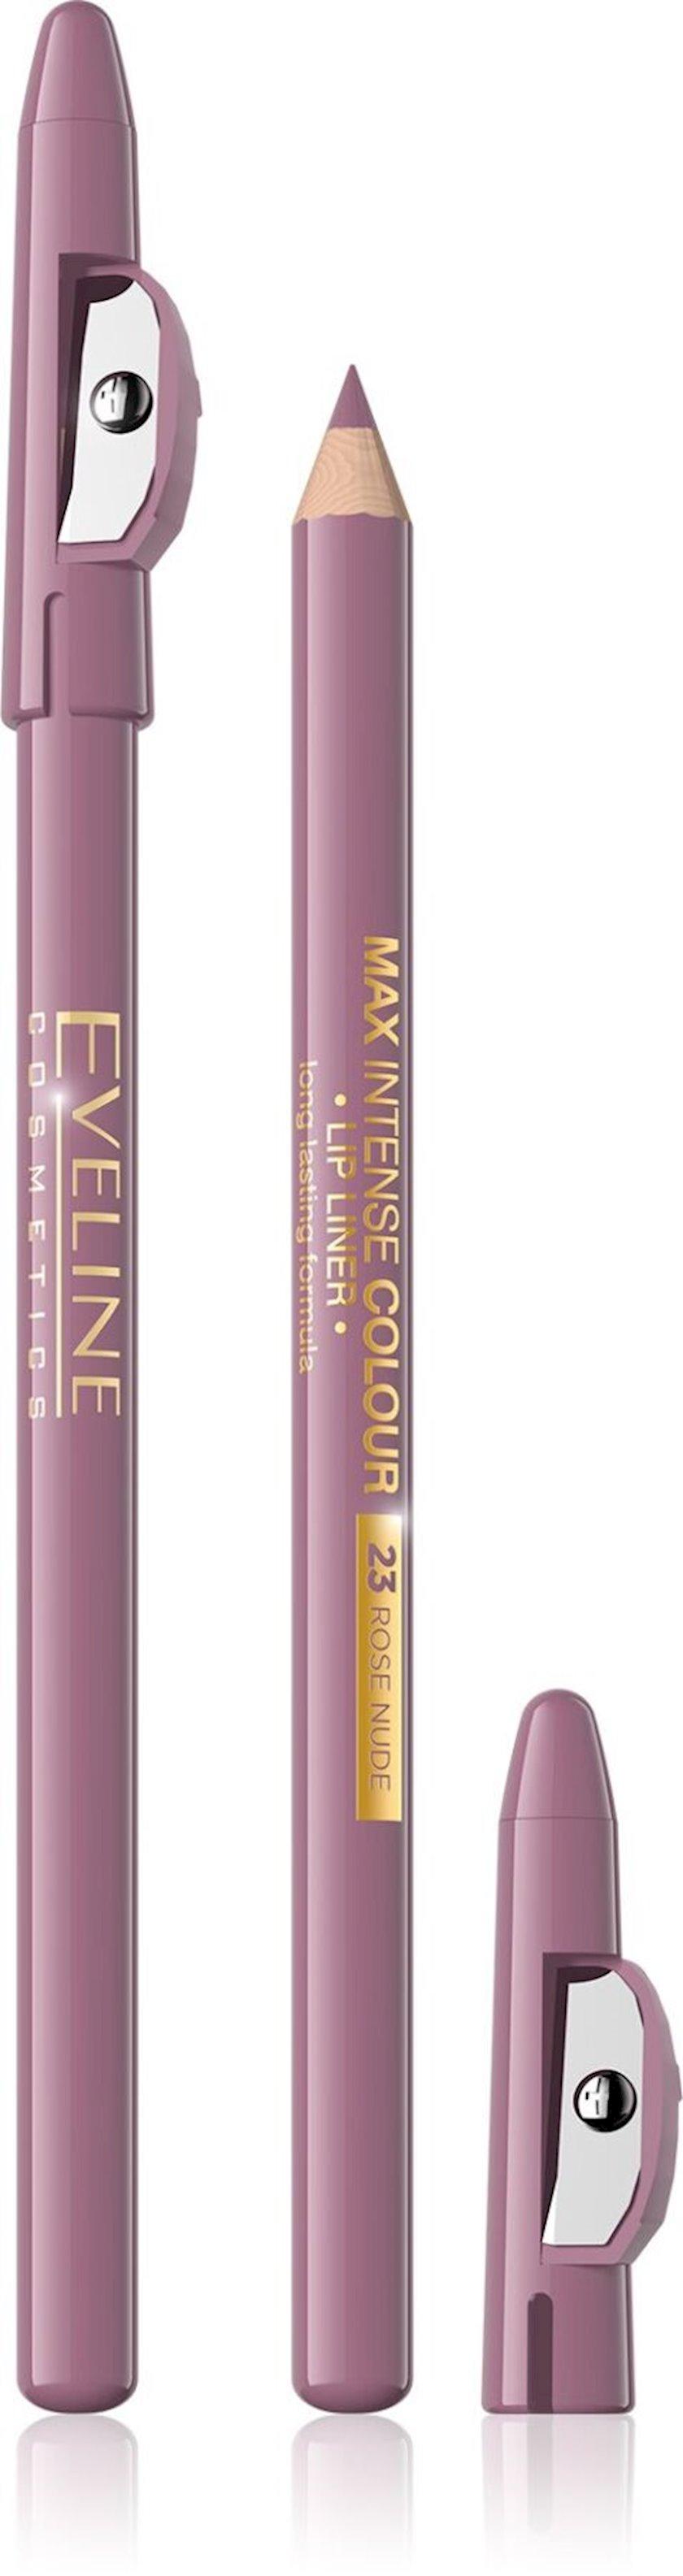 Dodaq layneri Eveline cosmetics Max intense colour №23 Rose Nude